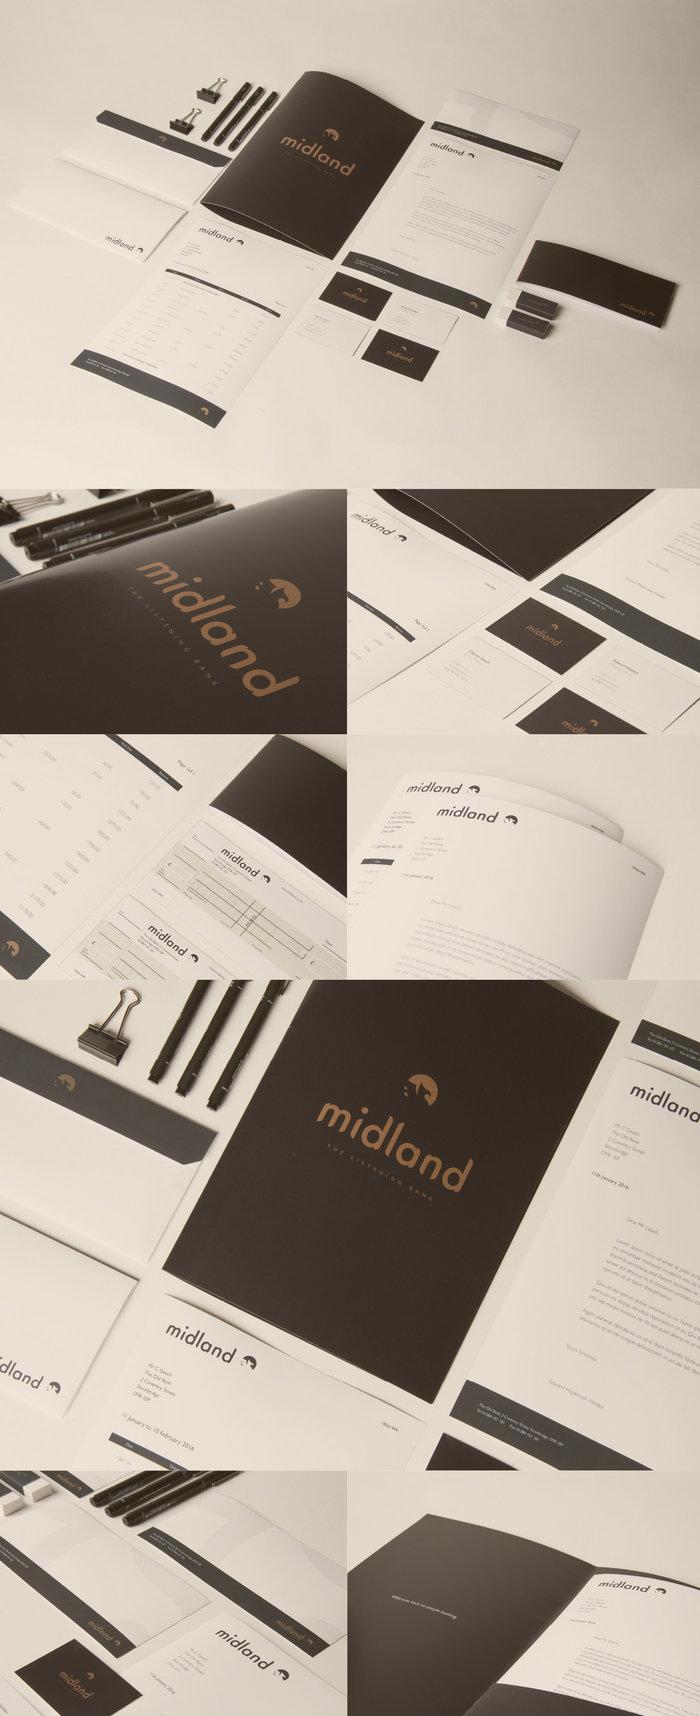 Midland Bank - Visual Identity